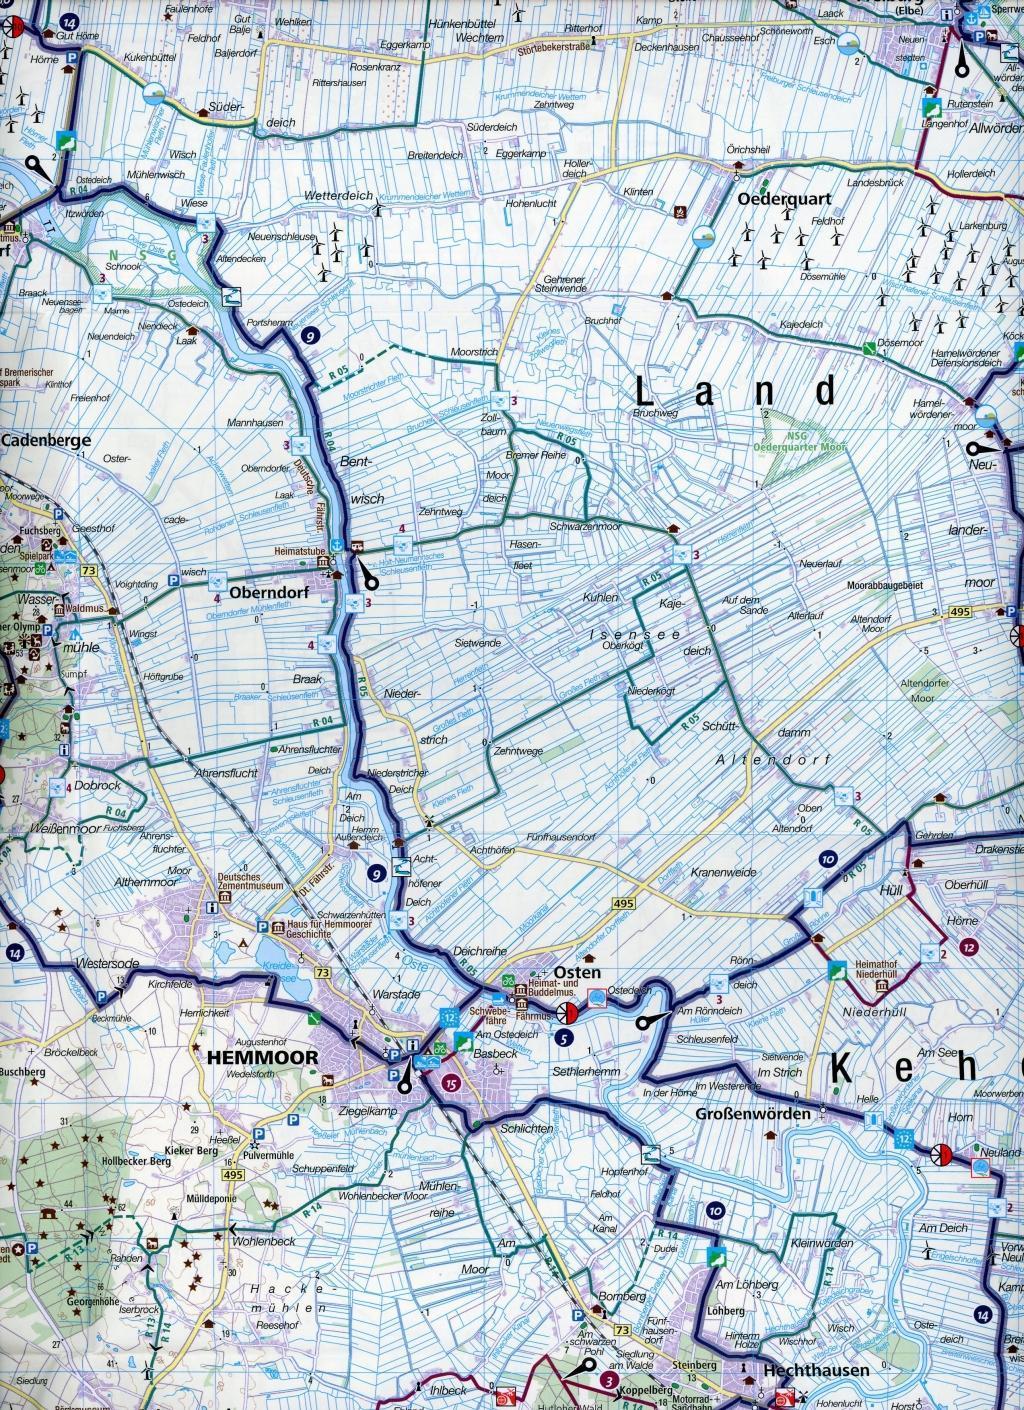 KOMPASS Fahrradkarte Elbe-Weser-Dreieck 1:70.000, FK 3313